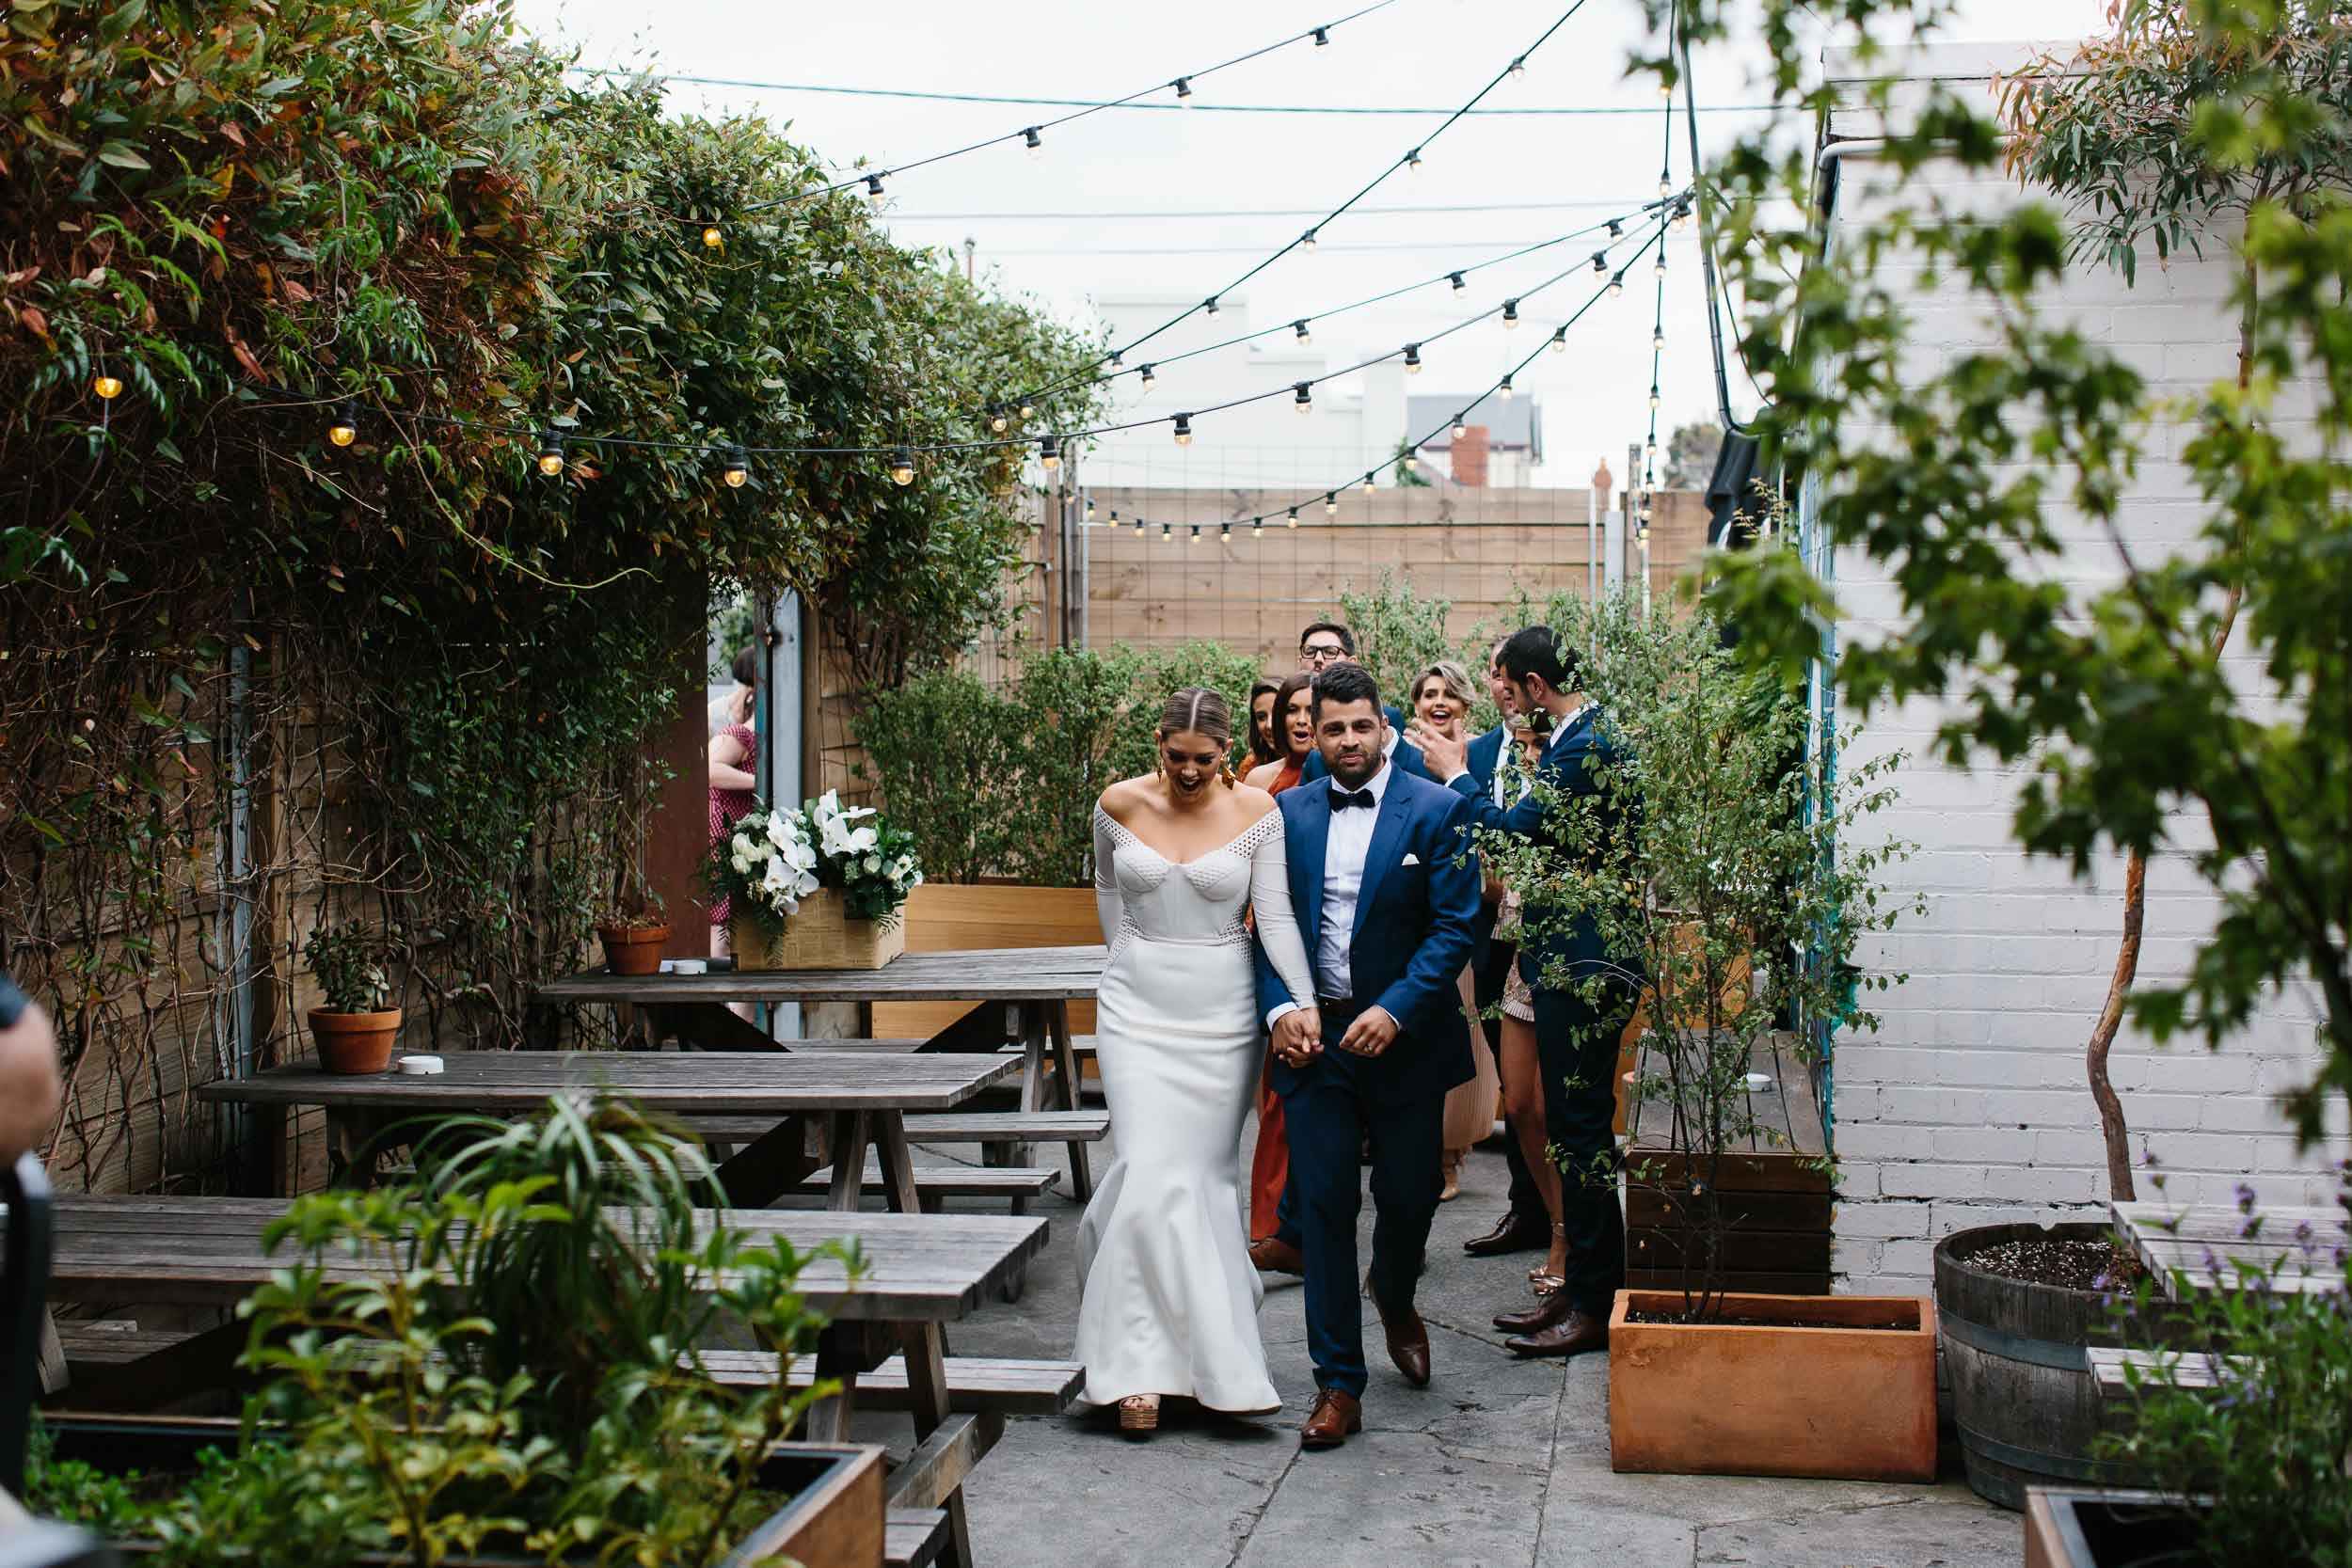 Kas-Richards-Urban-Melbourne-Wedding-Jason-Grech-639.jpg